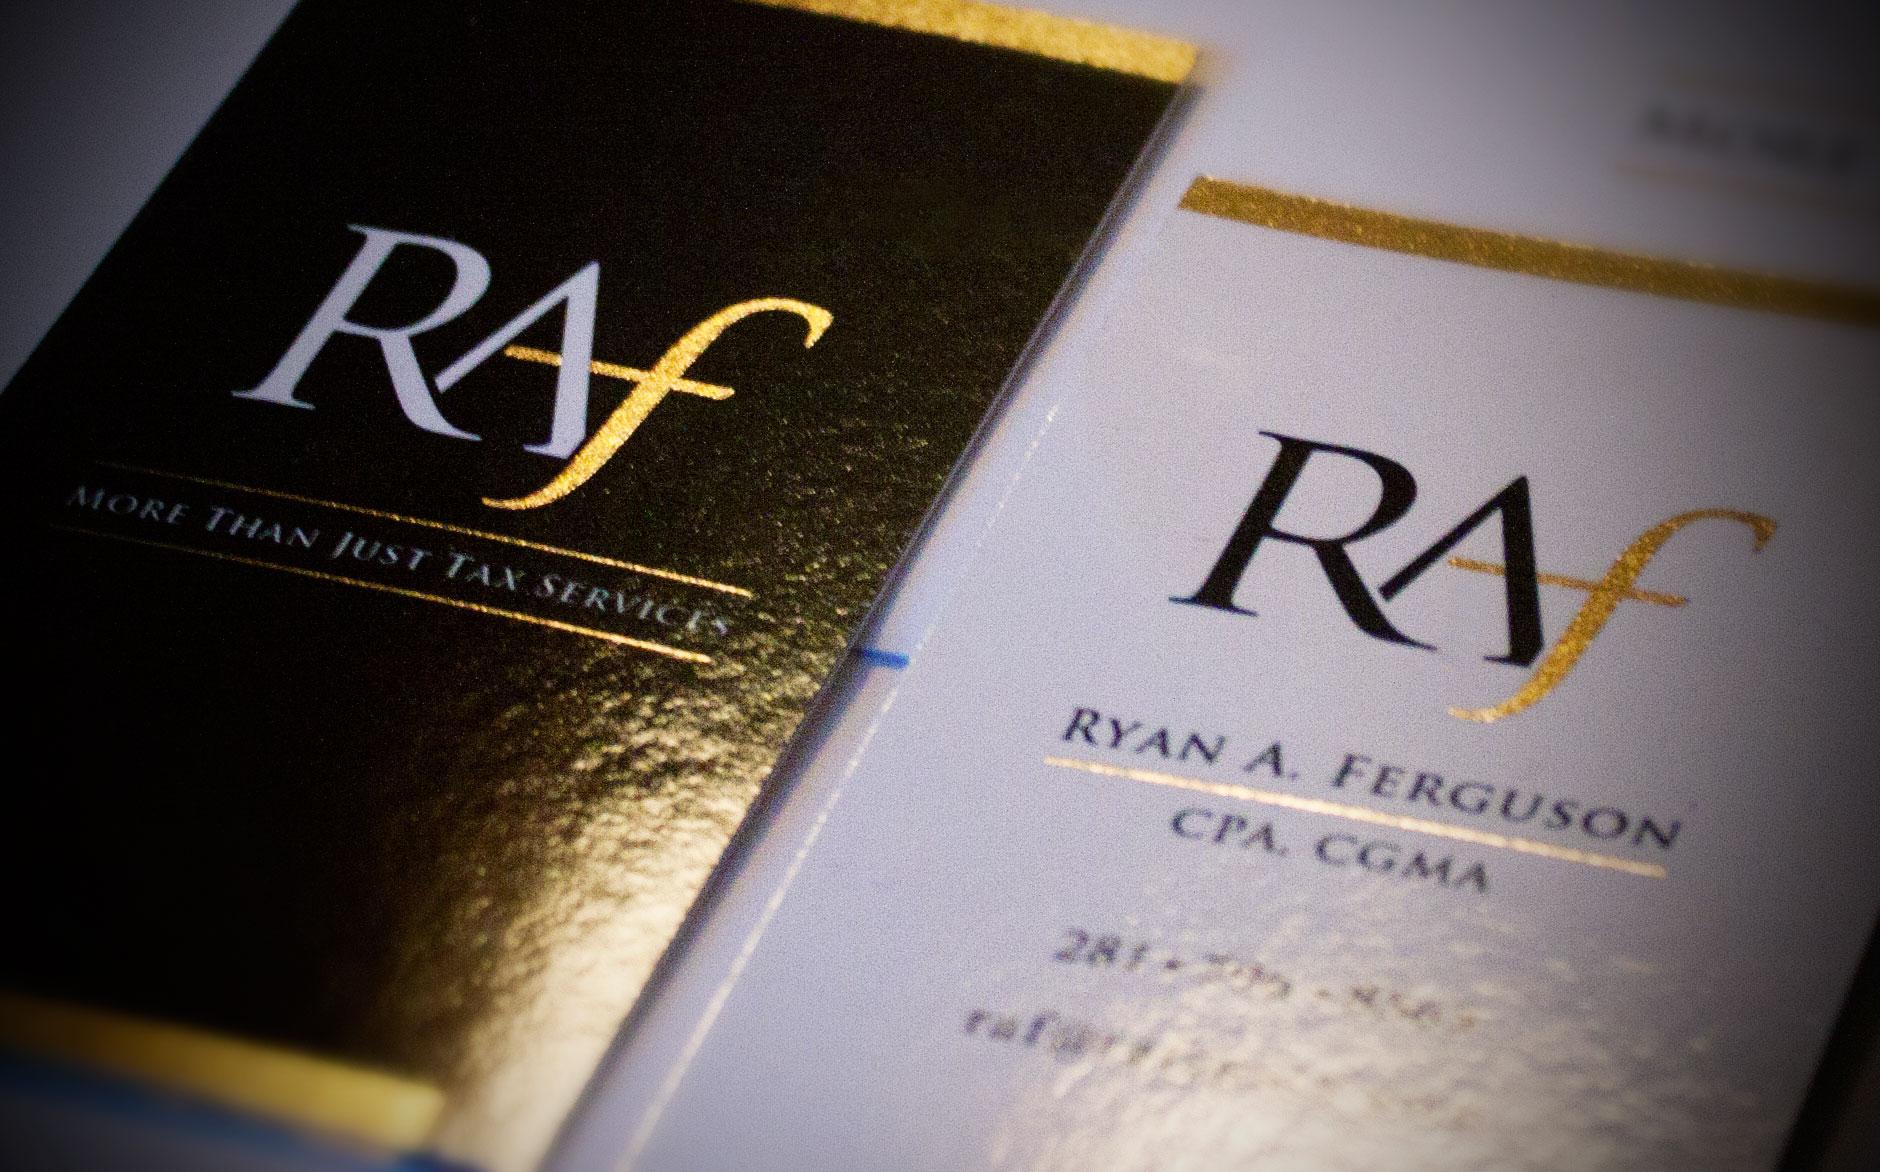 ryan_a_ferguson_business_card_mock_1